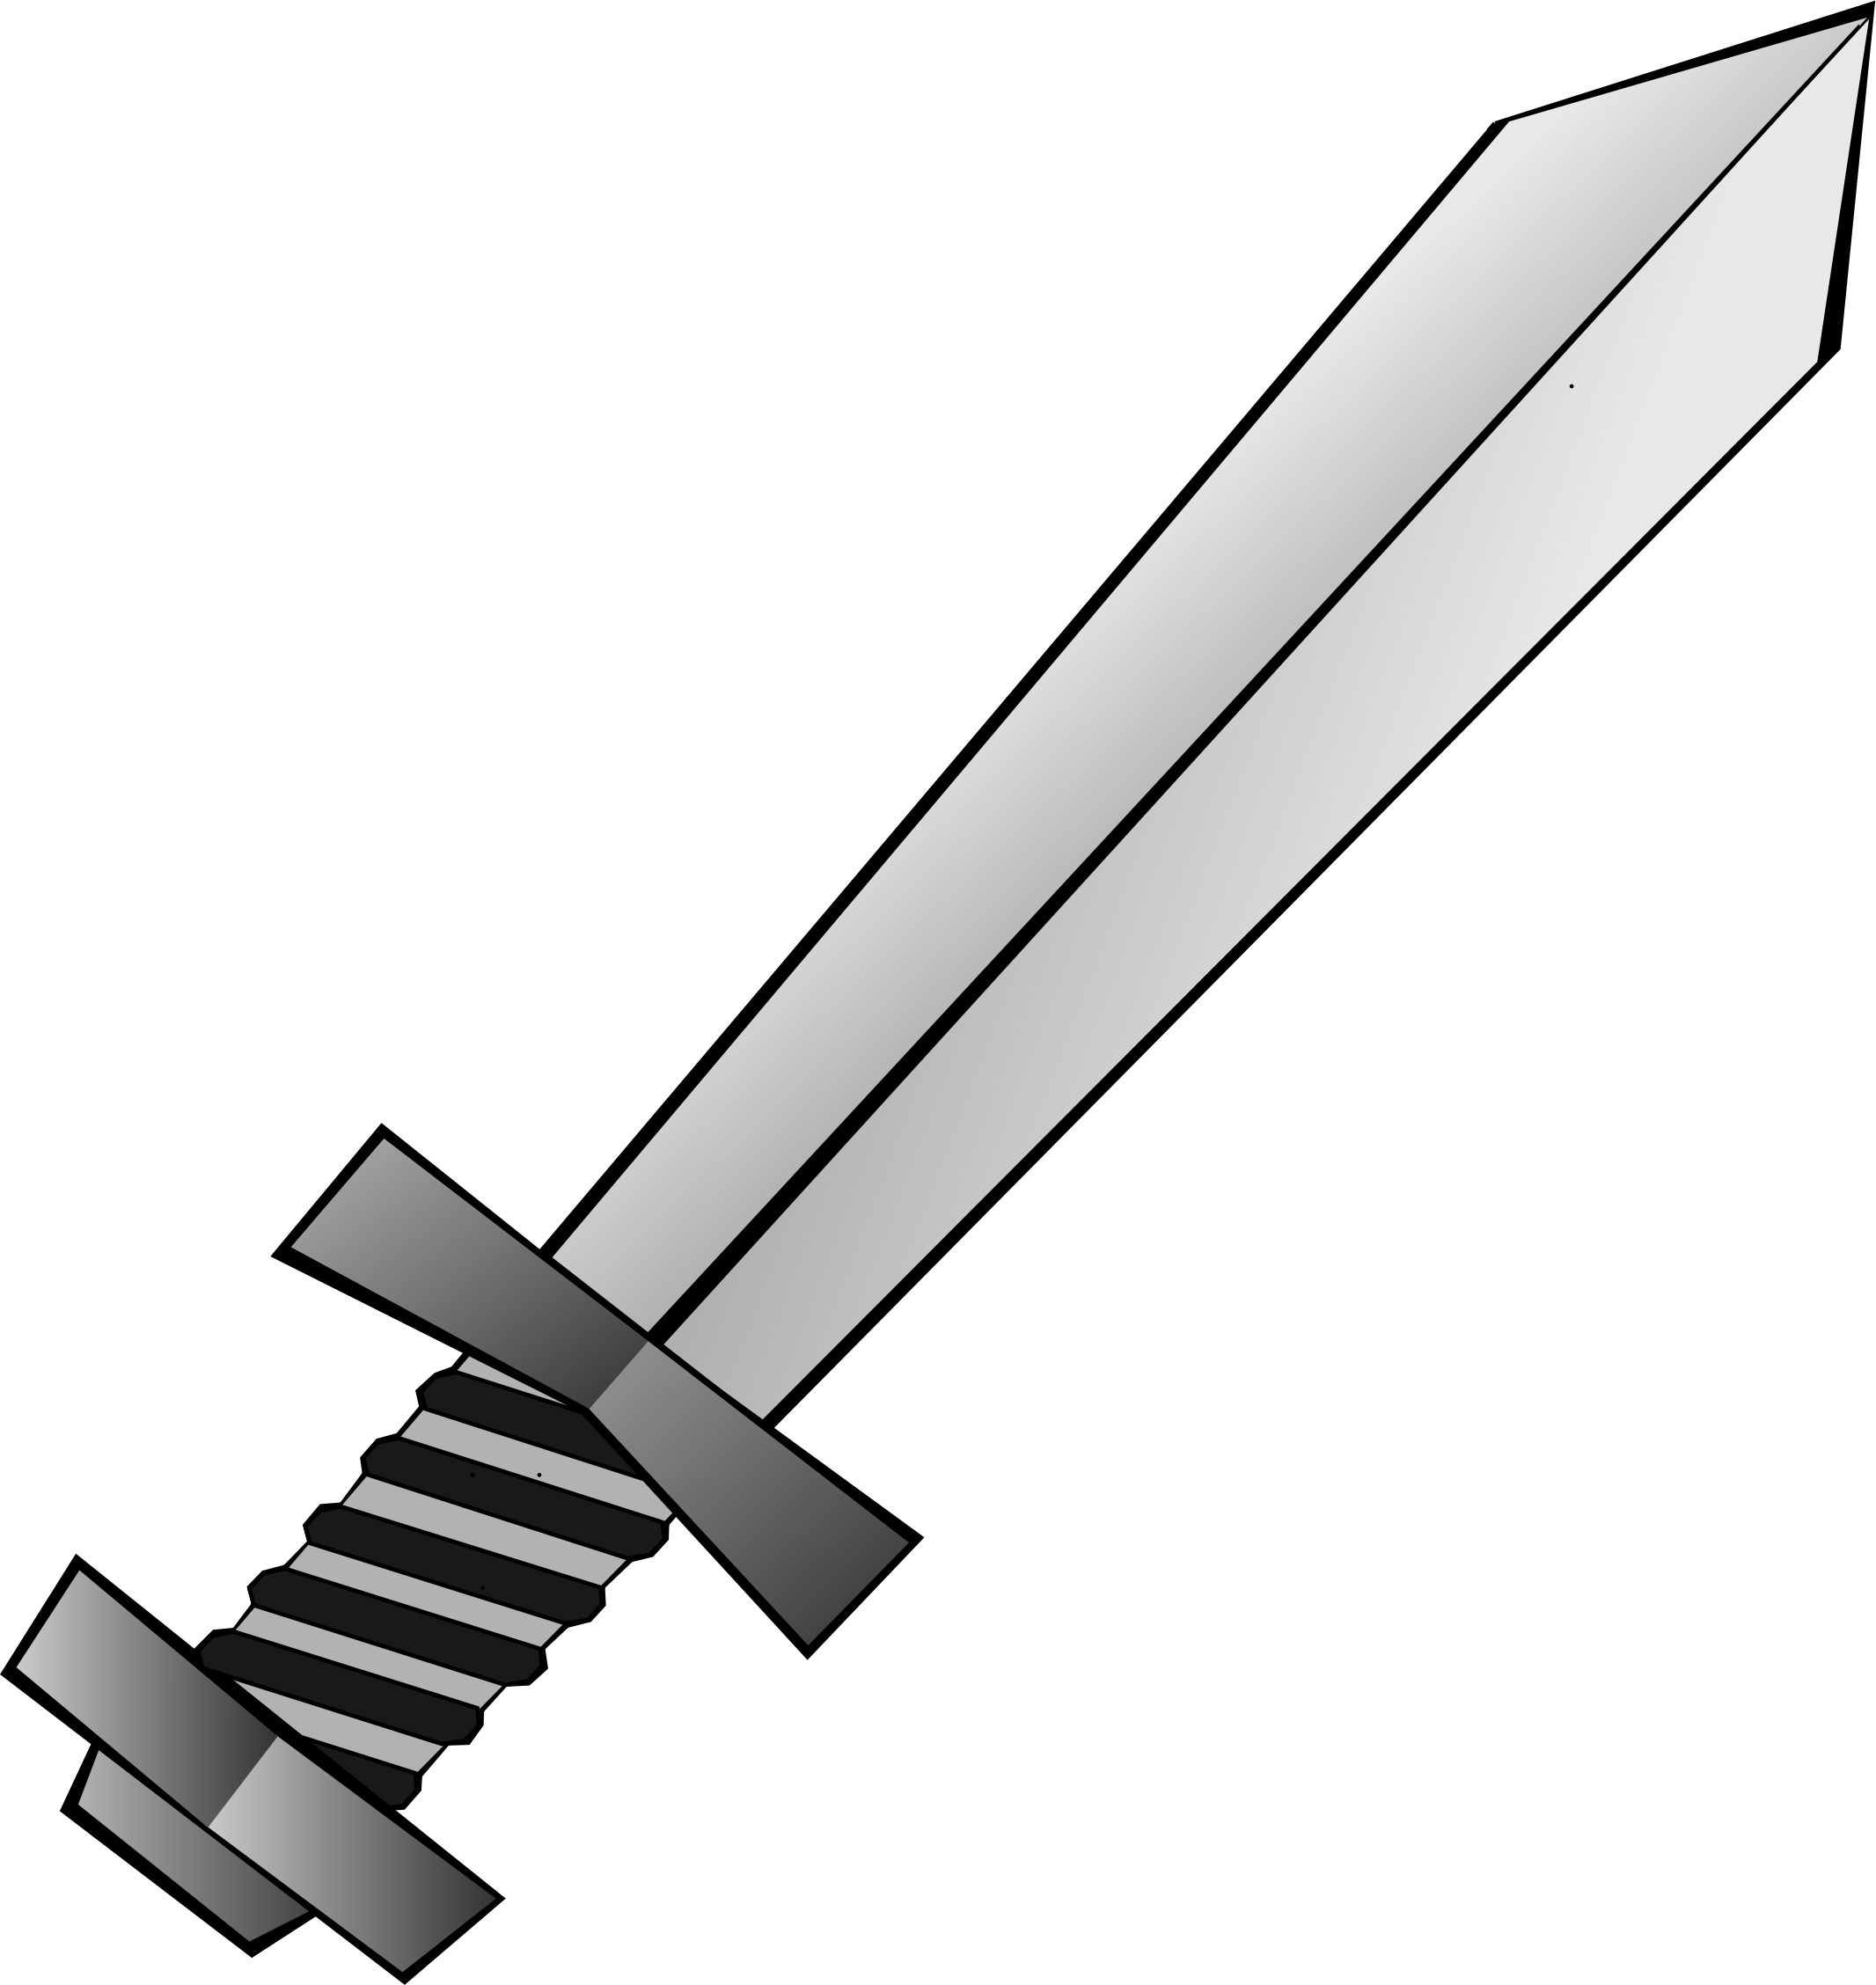 Clip art sword - ClipartFest